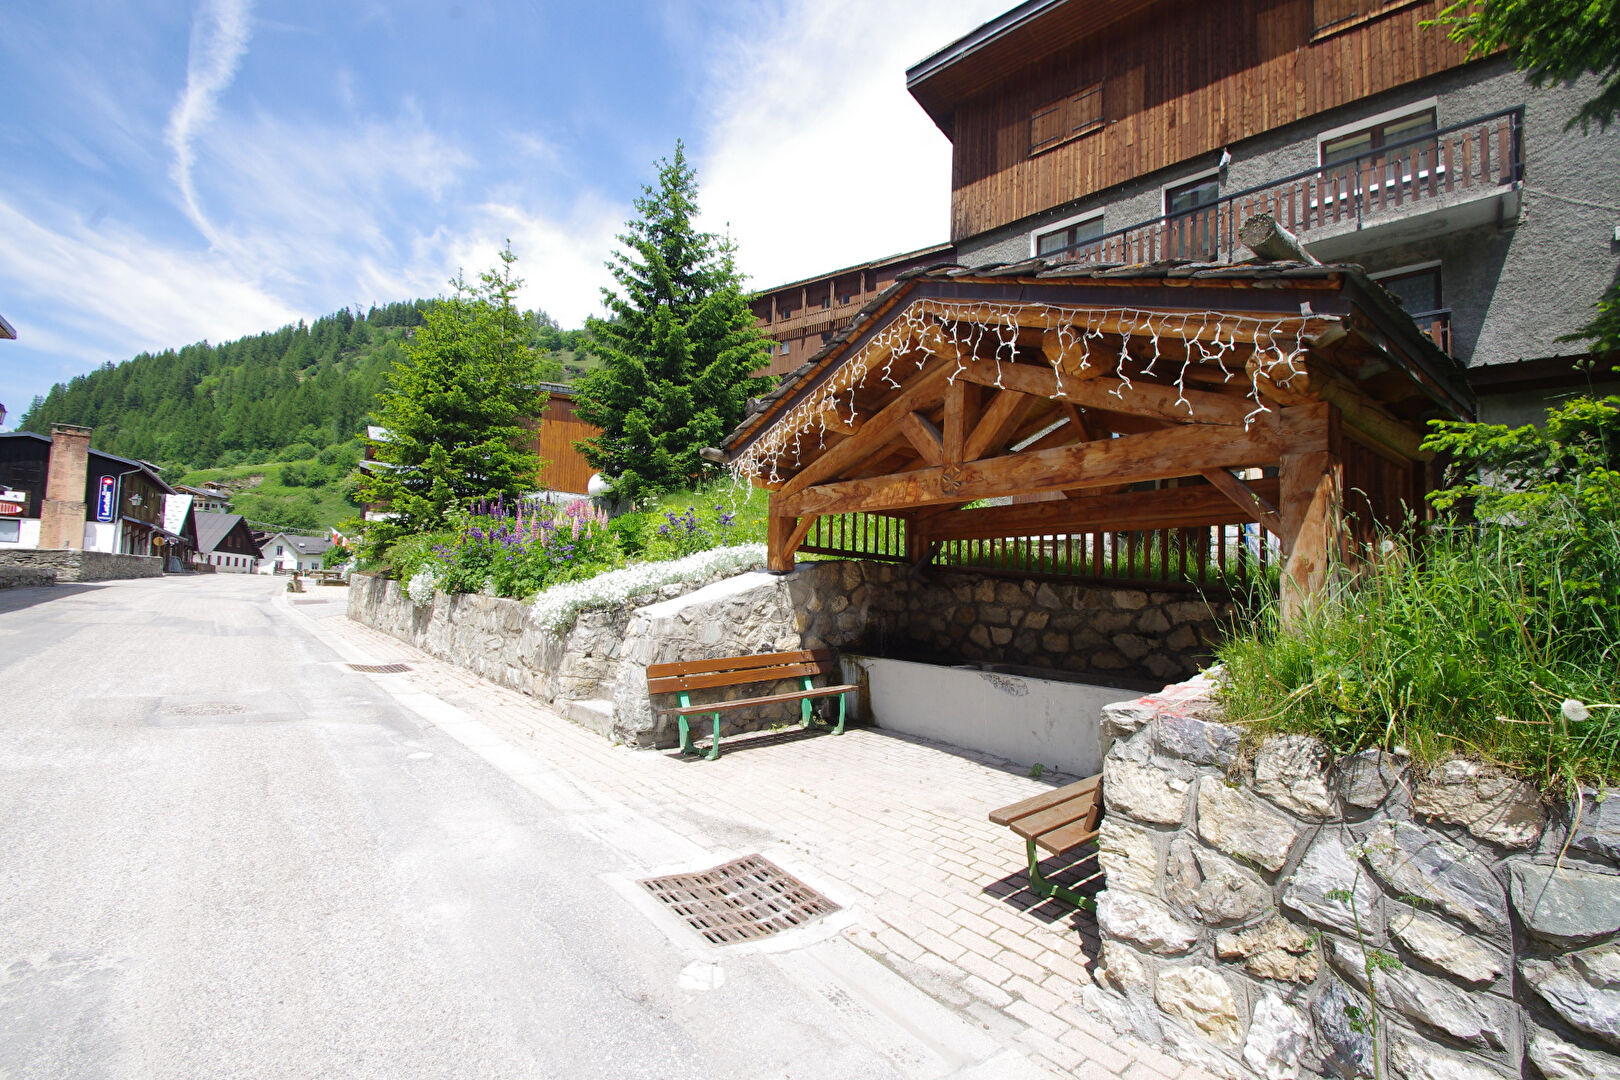 Photo of Hotel- Tignes Les Brévières